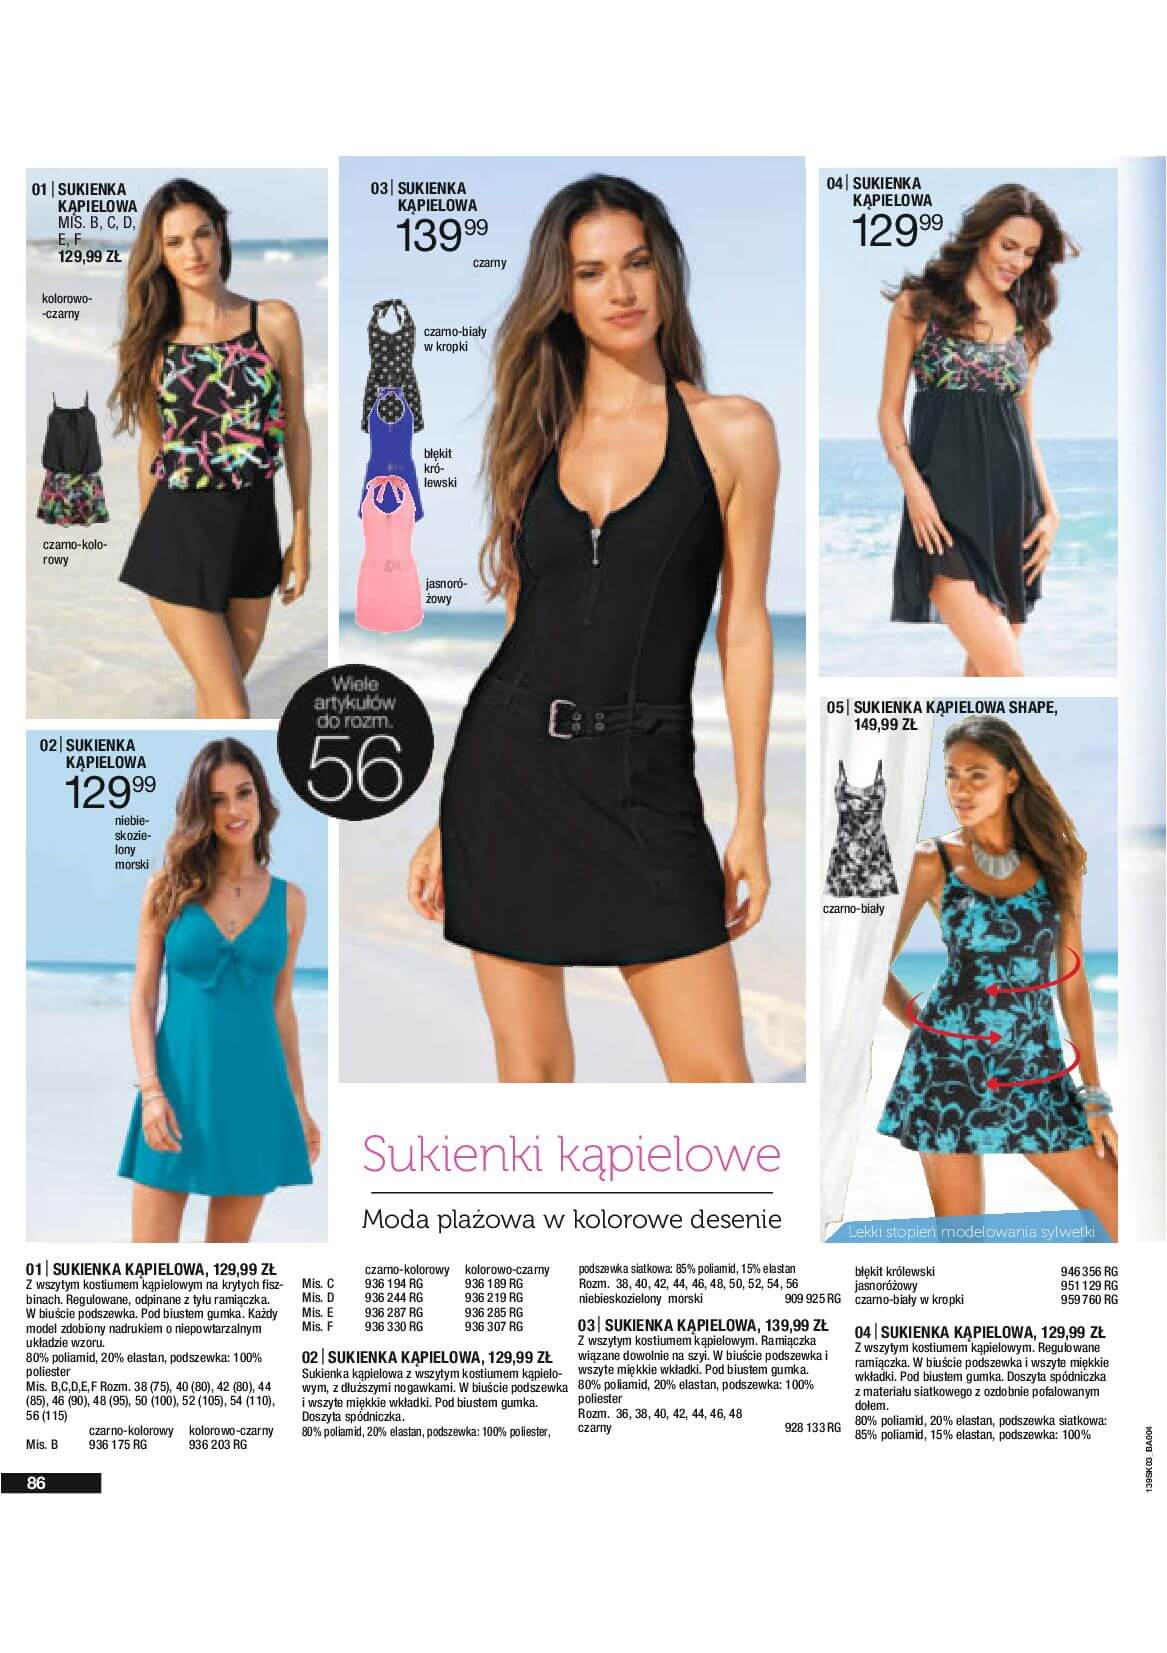 Gazetka Bonprix - Radosna moda-10.03.2019-25.06.2019-page-88